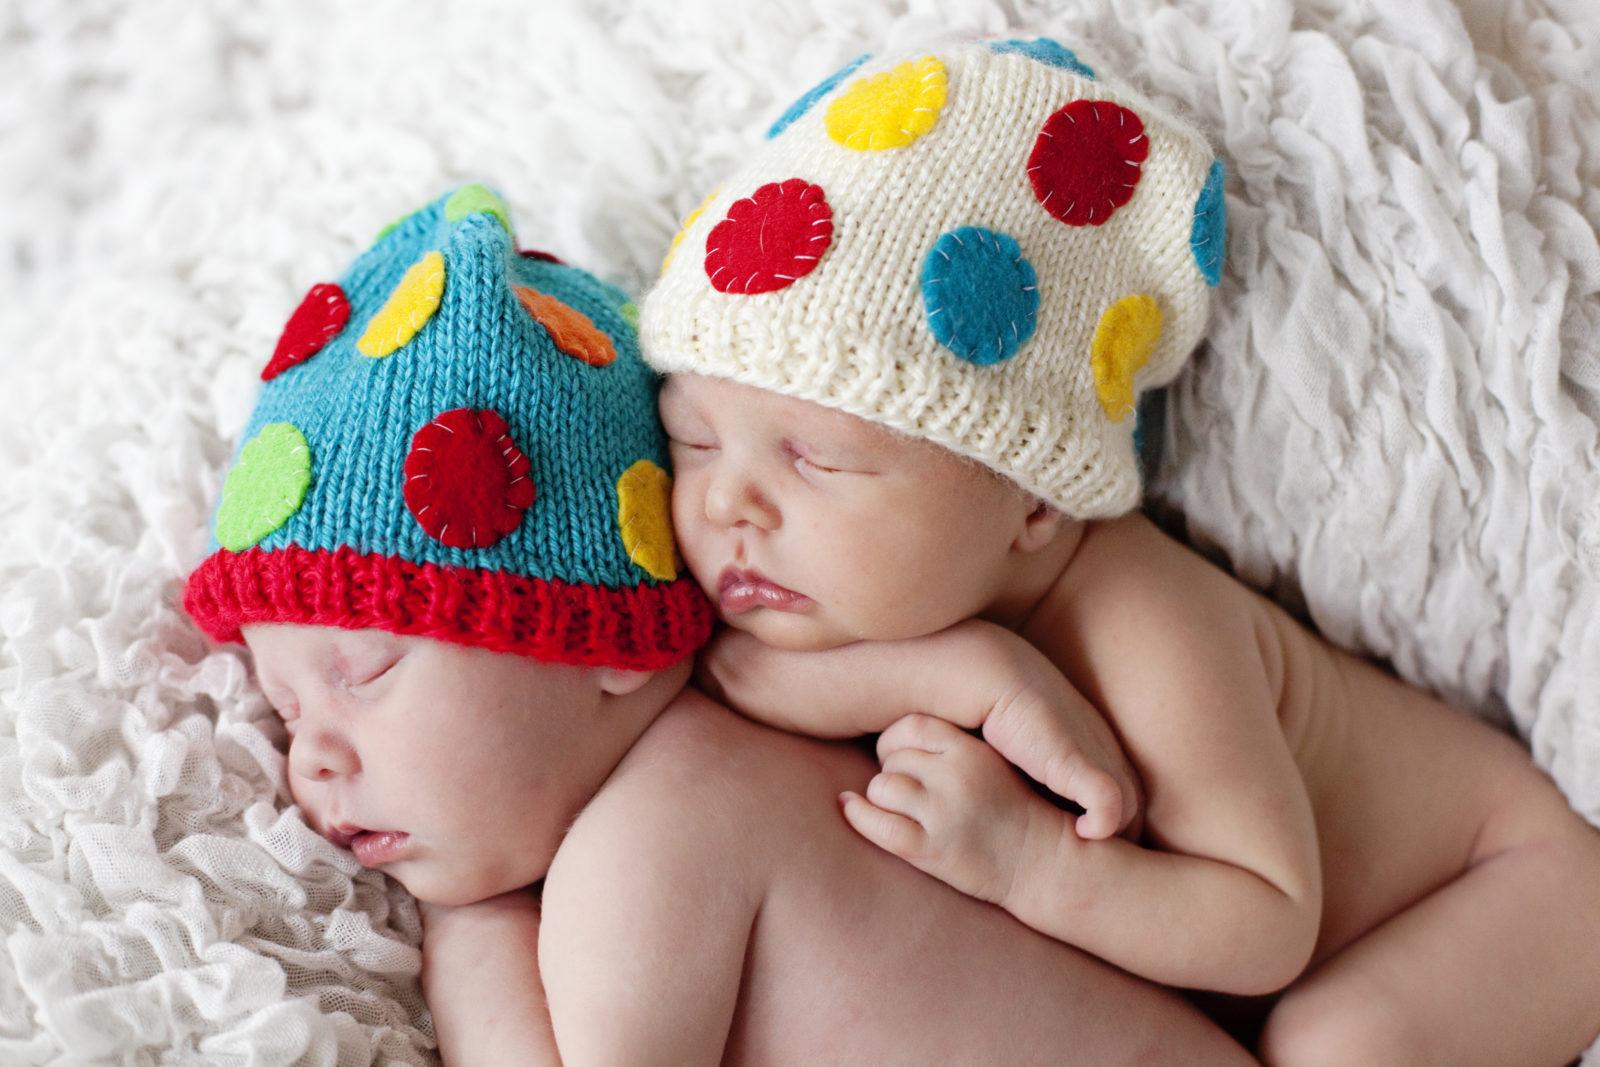 calgary postpartum doula services